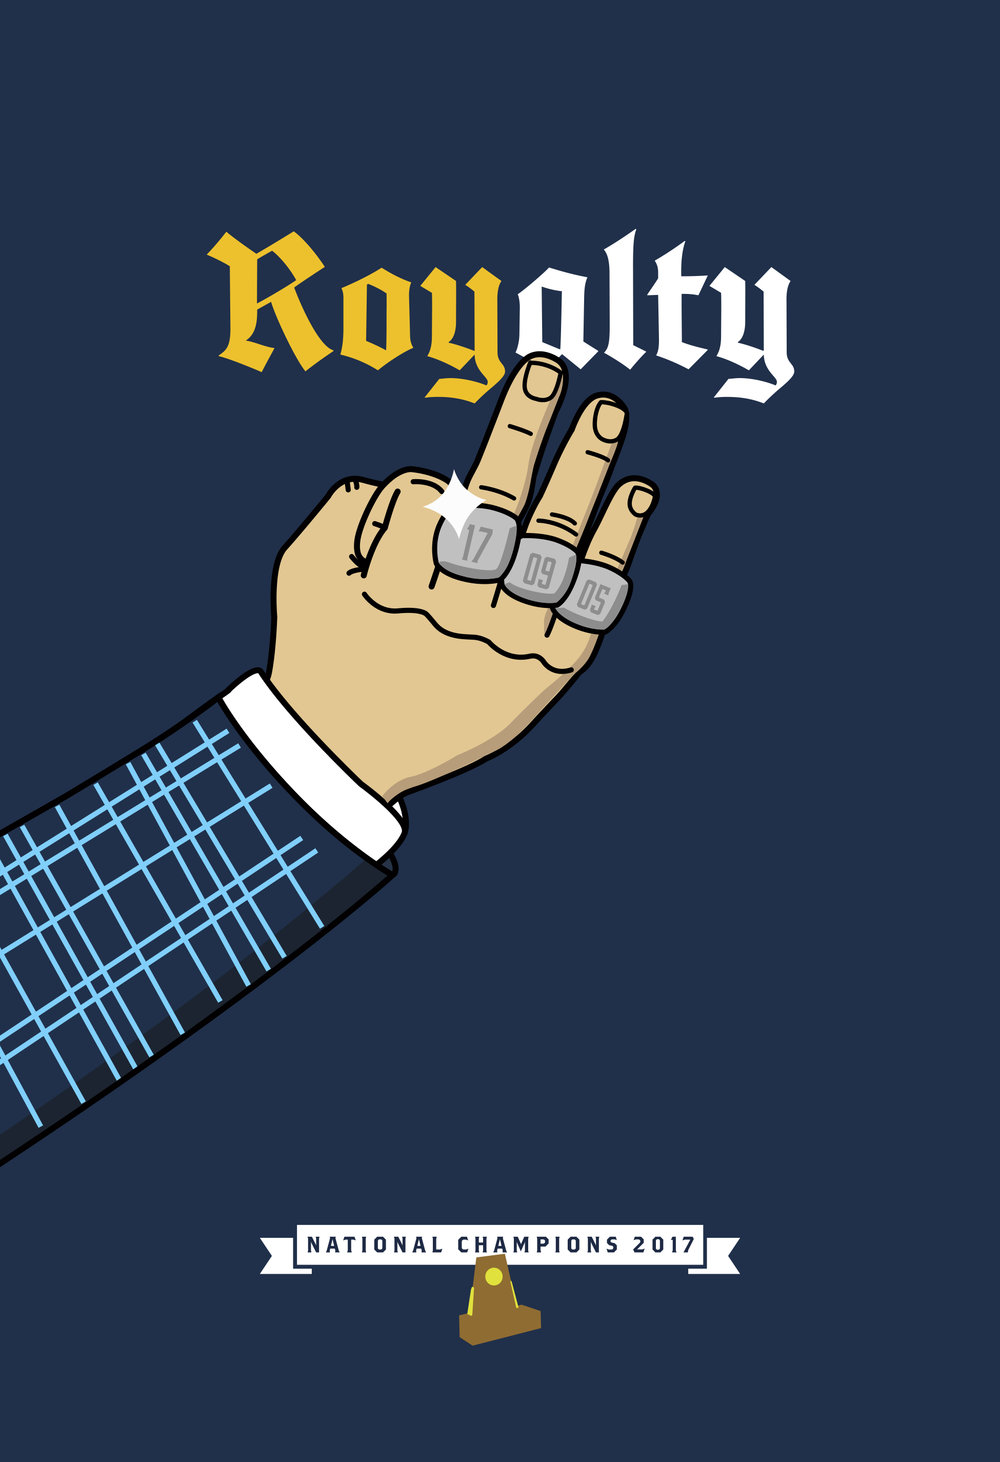 royalty_poster_file.jpg